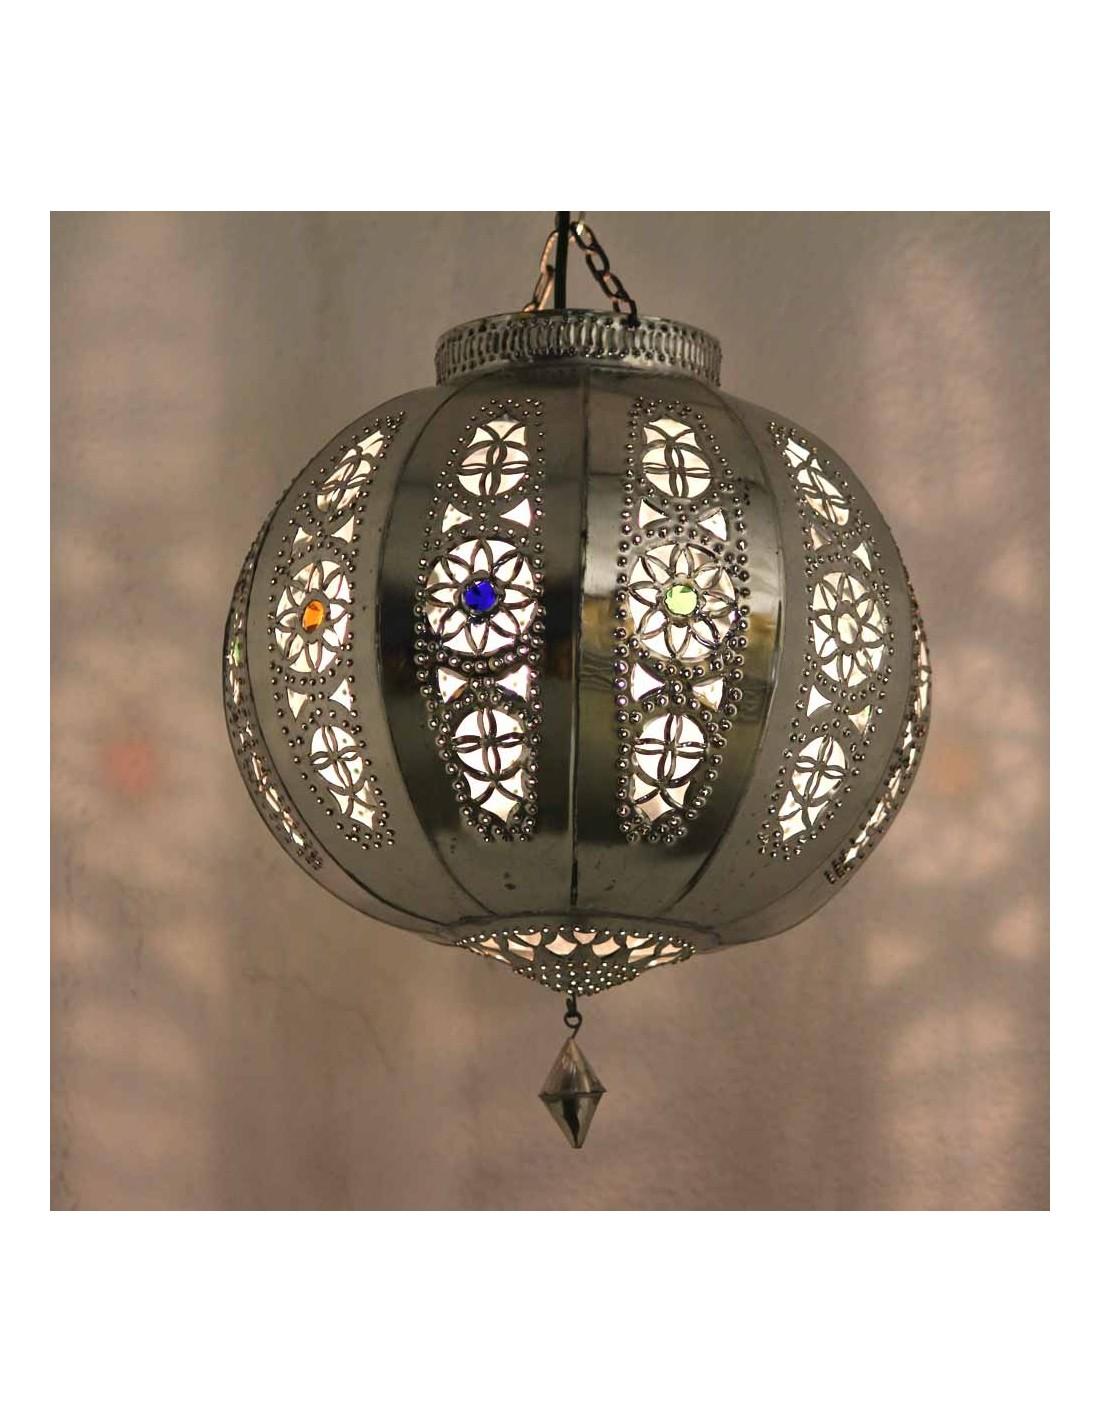 orientalische lampe silberkugel yali marokko galerie. Black Bedroom Furniture Sets. Home Design Ideas